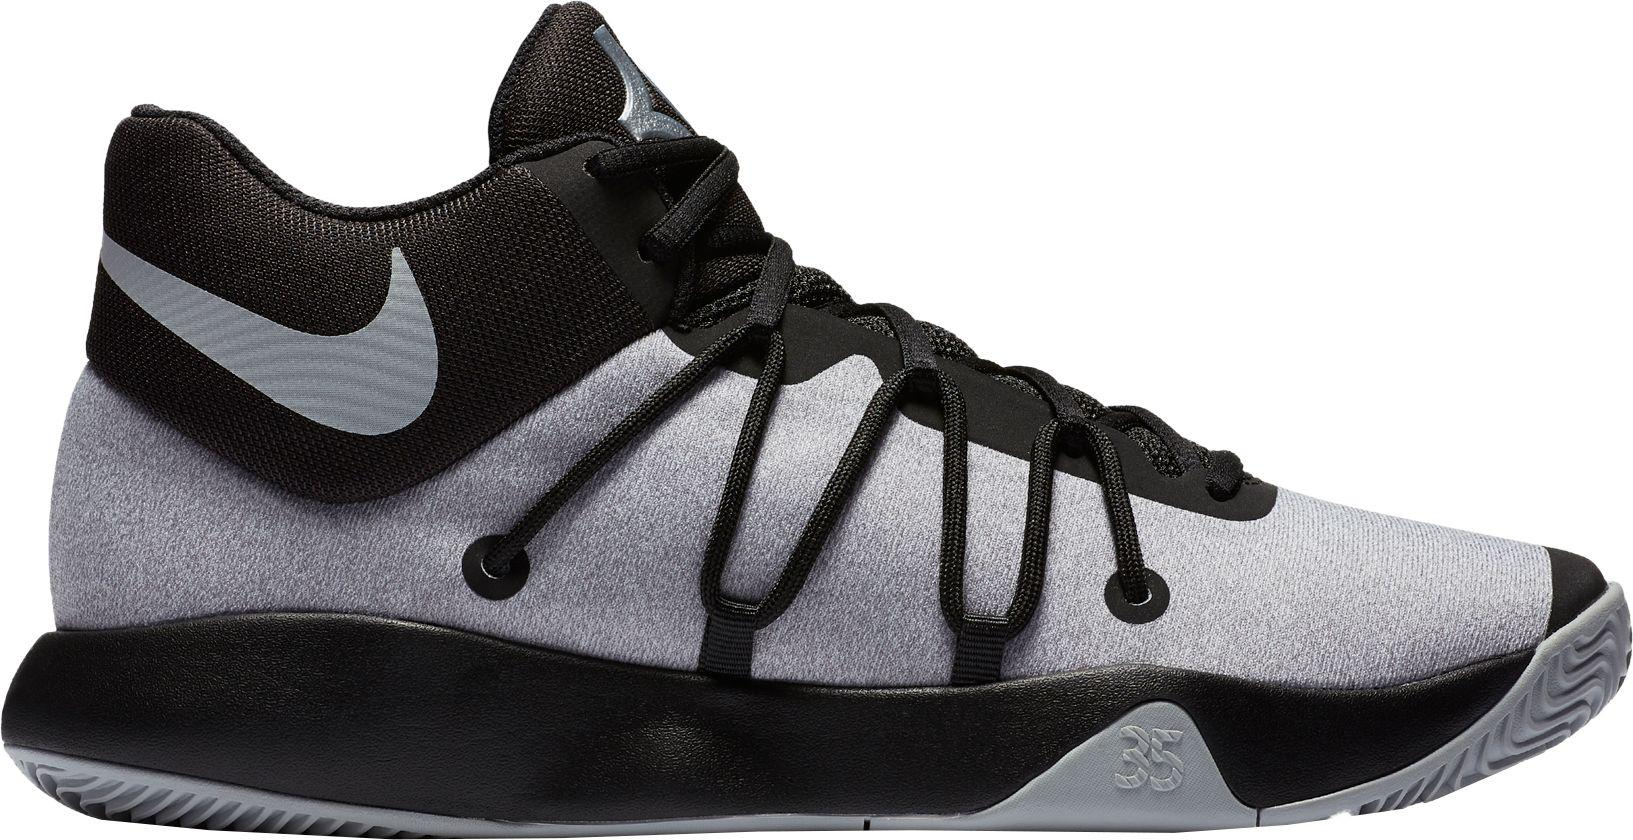 meet 2804c 4051f Nike - Black Kd Trey 5 V Basketball Shoes for Men - Lyst